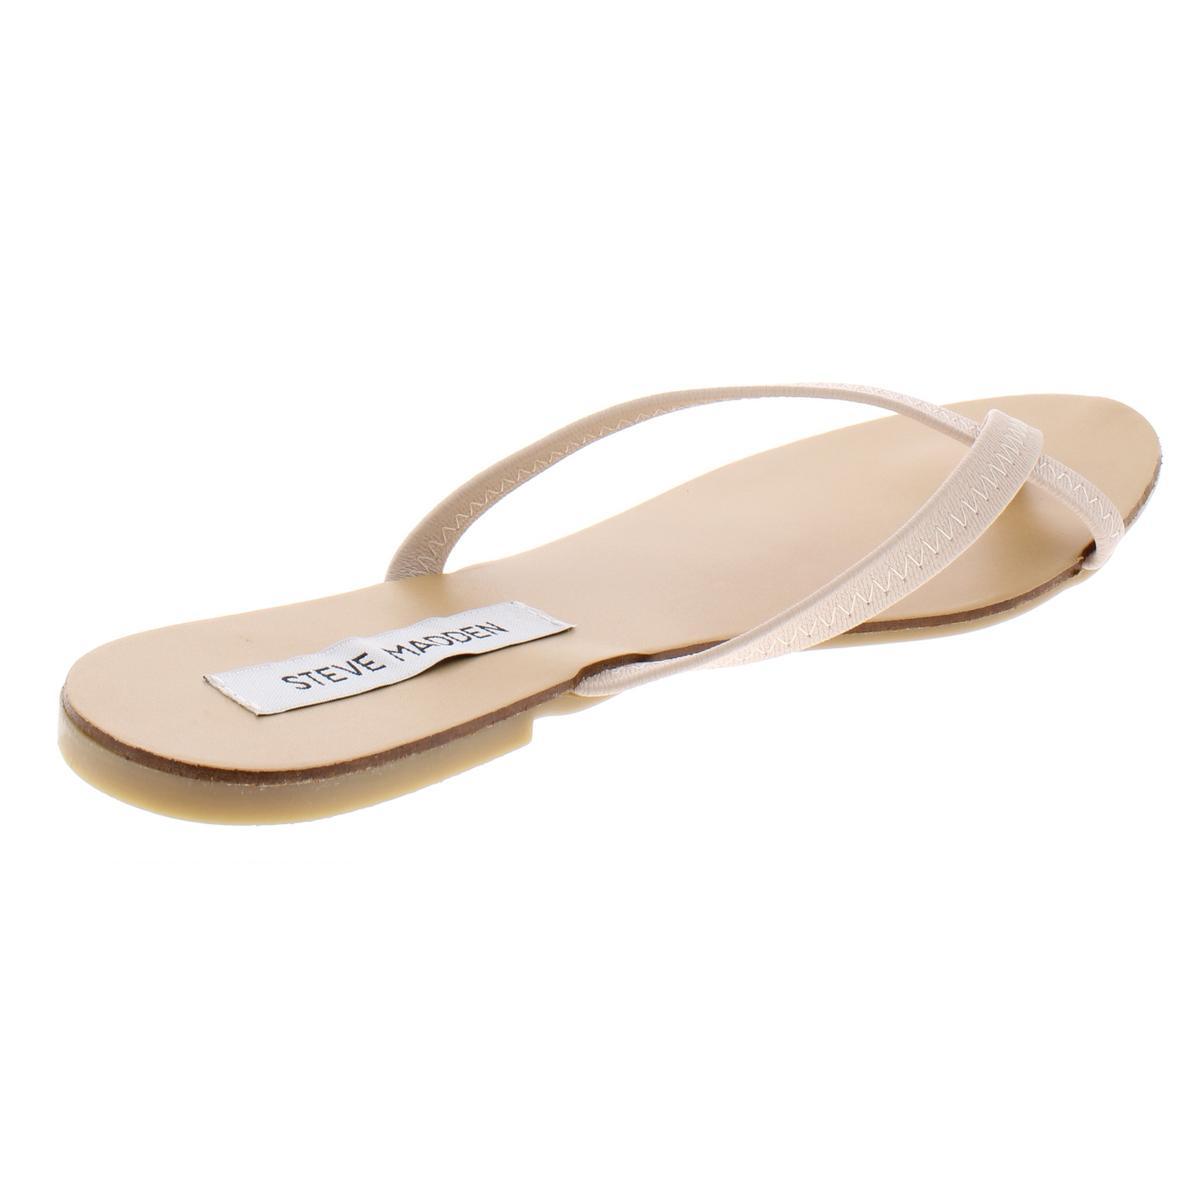 Steve-Madden-Womens-Coast-Toe-Loop-Stretch-Flats-Flip-Flops-Sandals-BHFO-0849 thumbnail 8